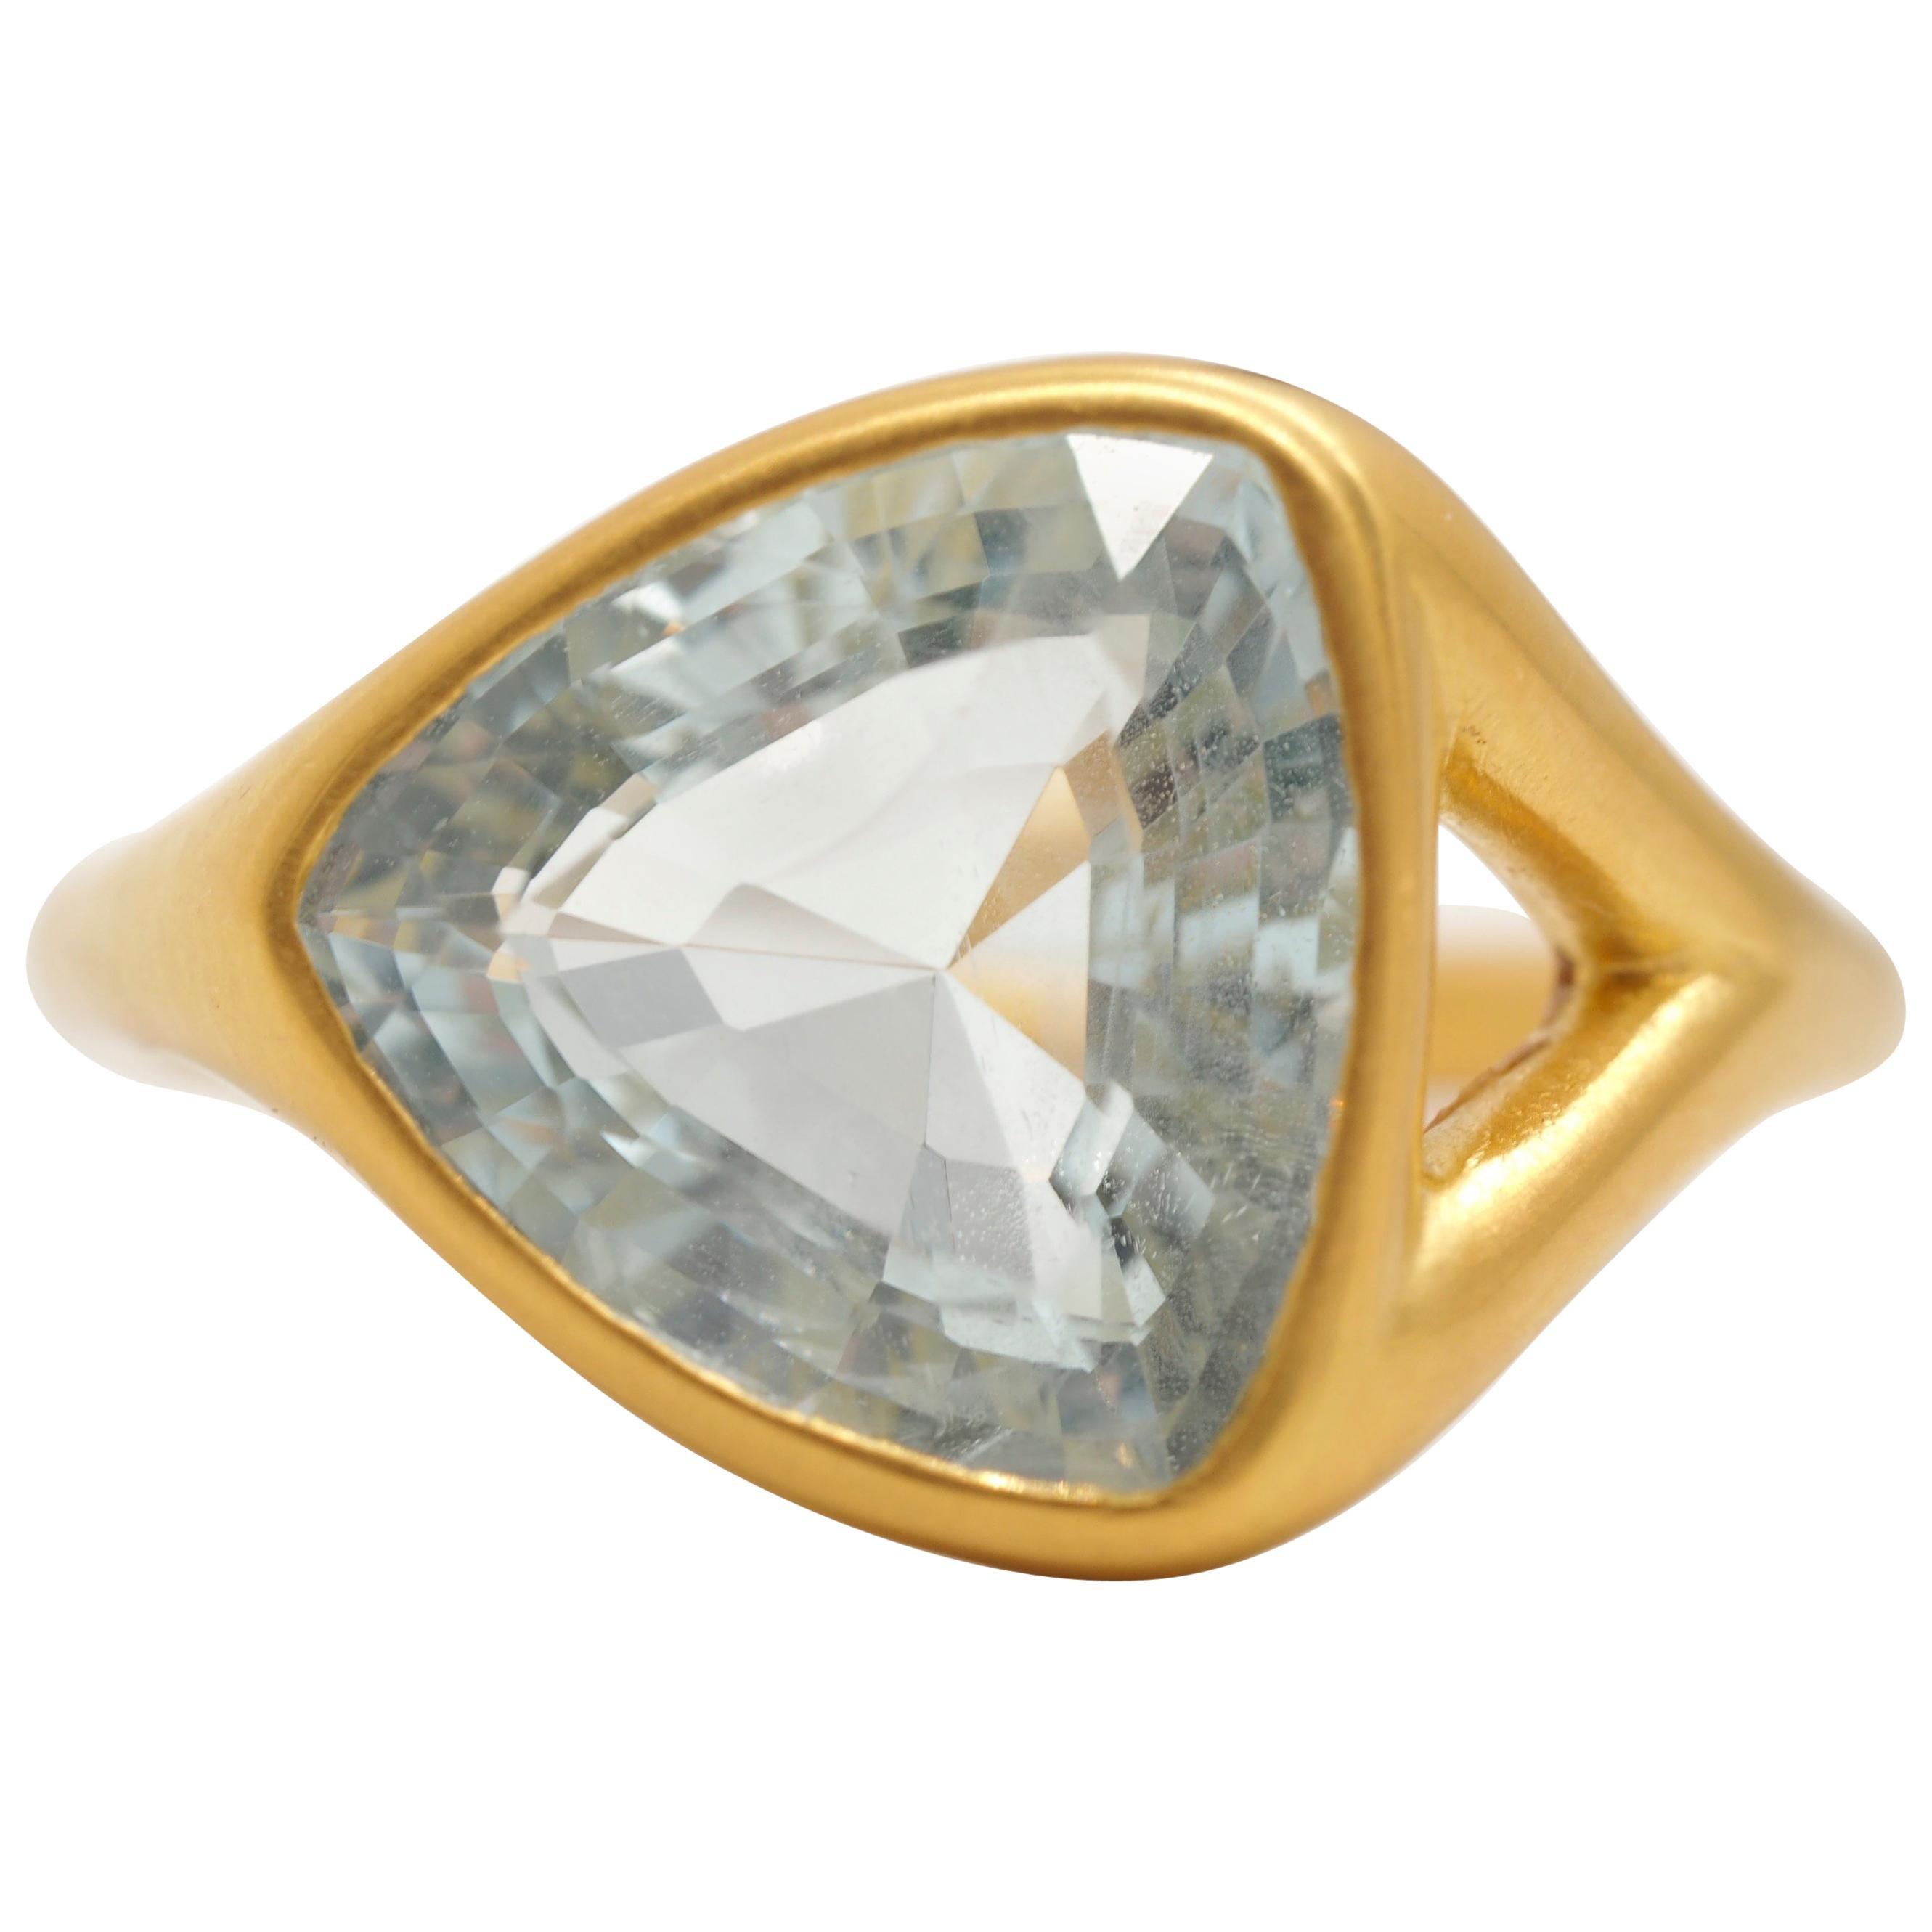 Scrives Aquamarine 22 Karat Gold Cocktail Ring